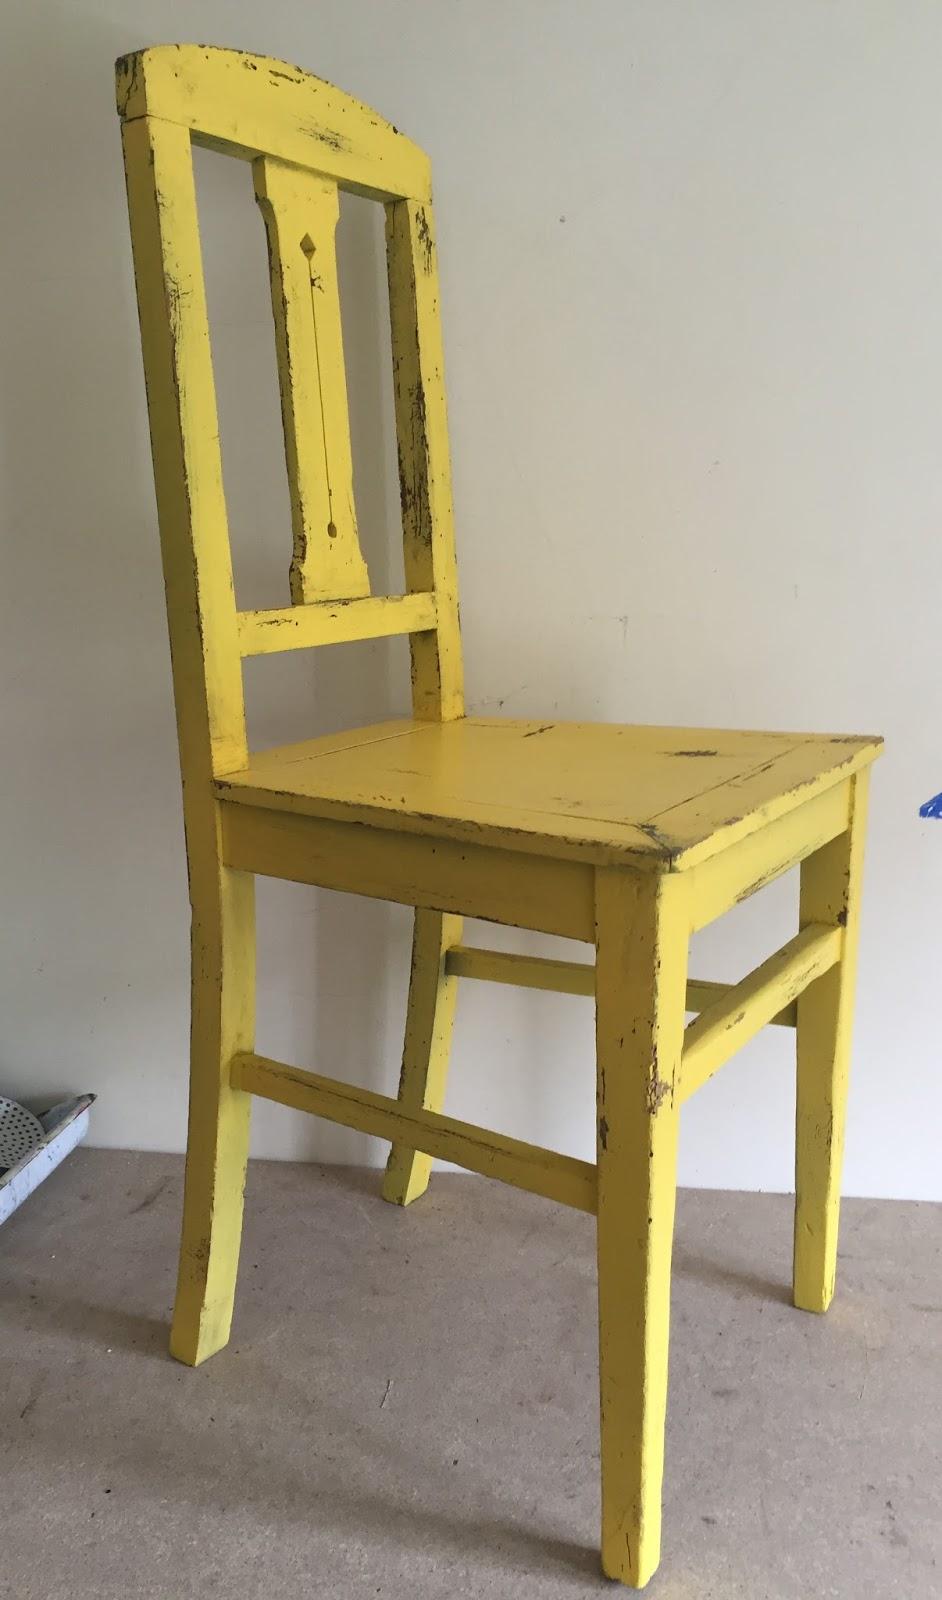 Pintar sillas de madera en blanco interesting comedor - Pintar sillas de madera ...